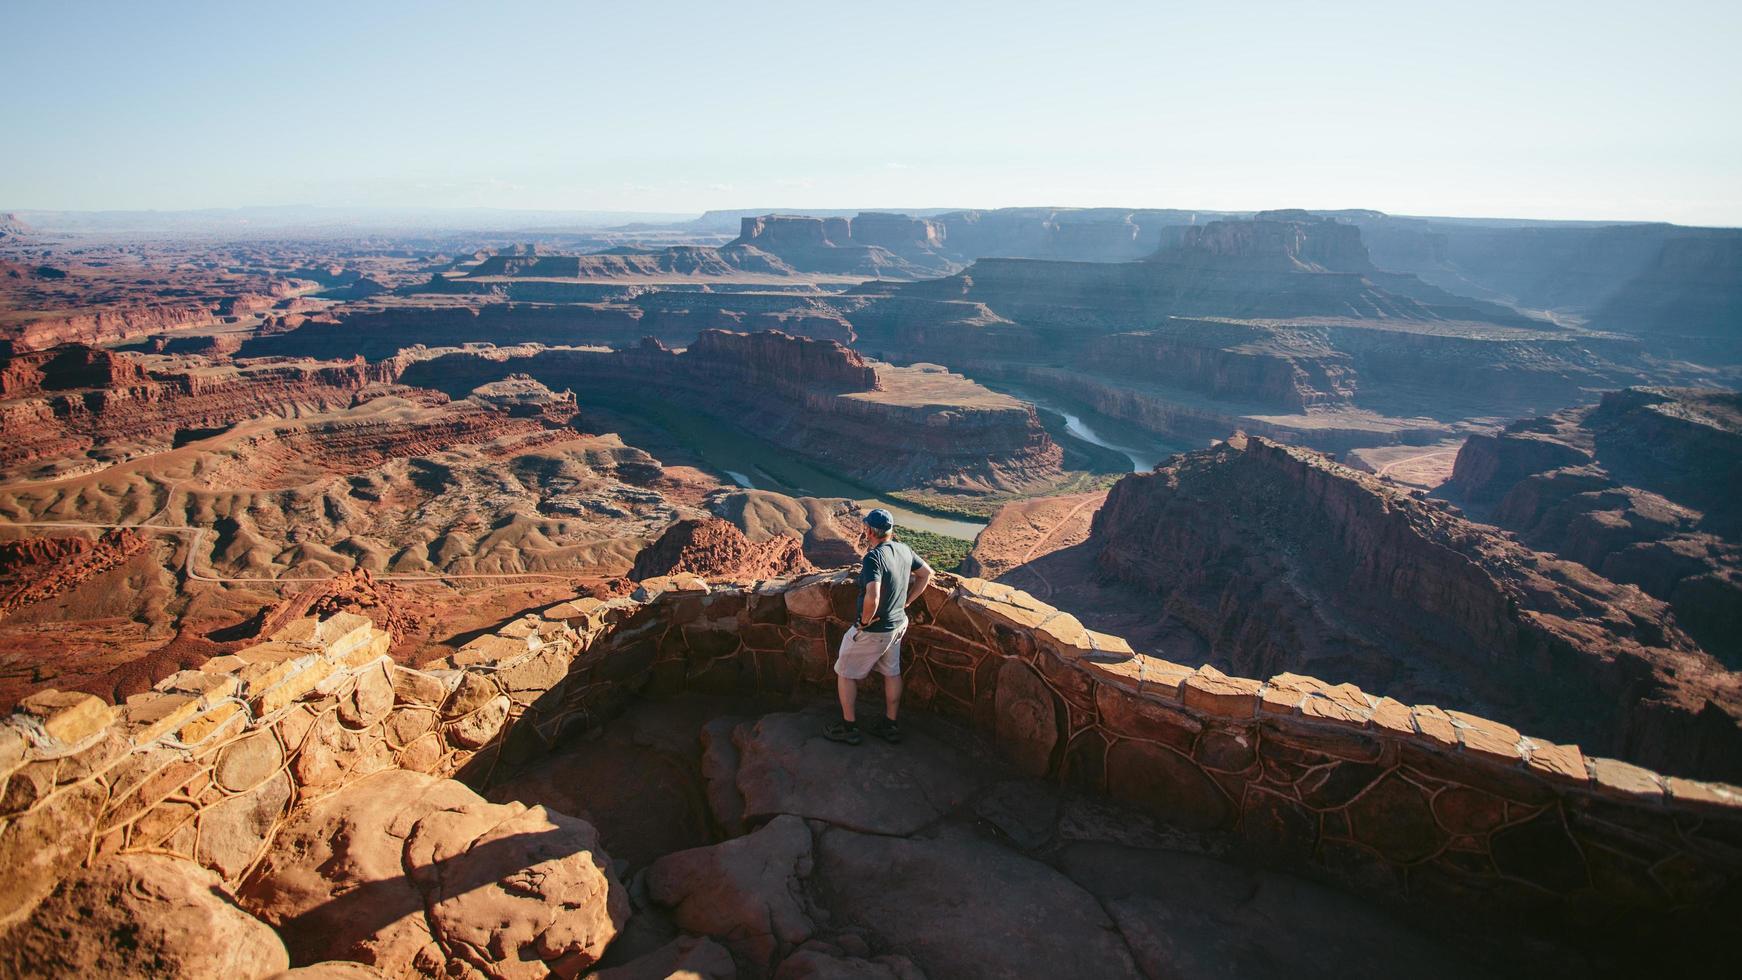 Man overlooking Grand Canyon photo